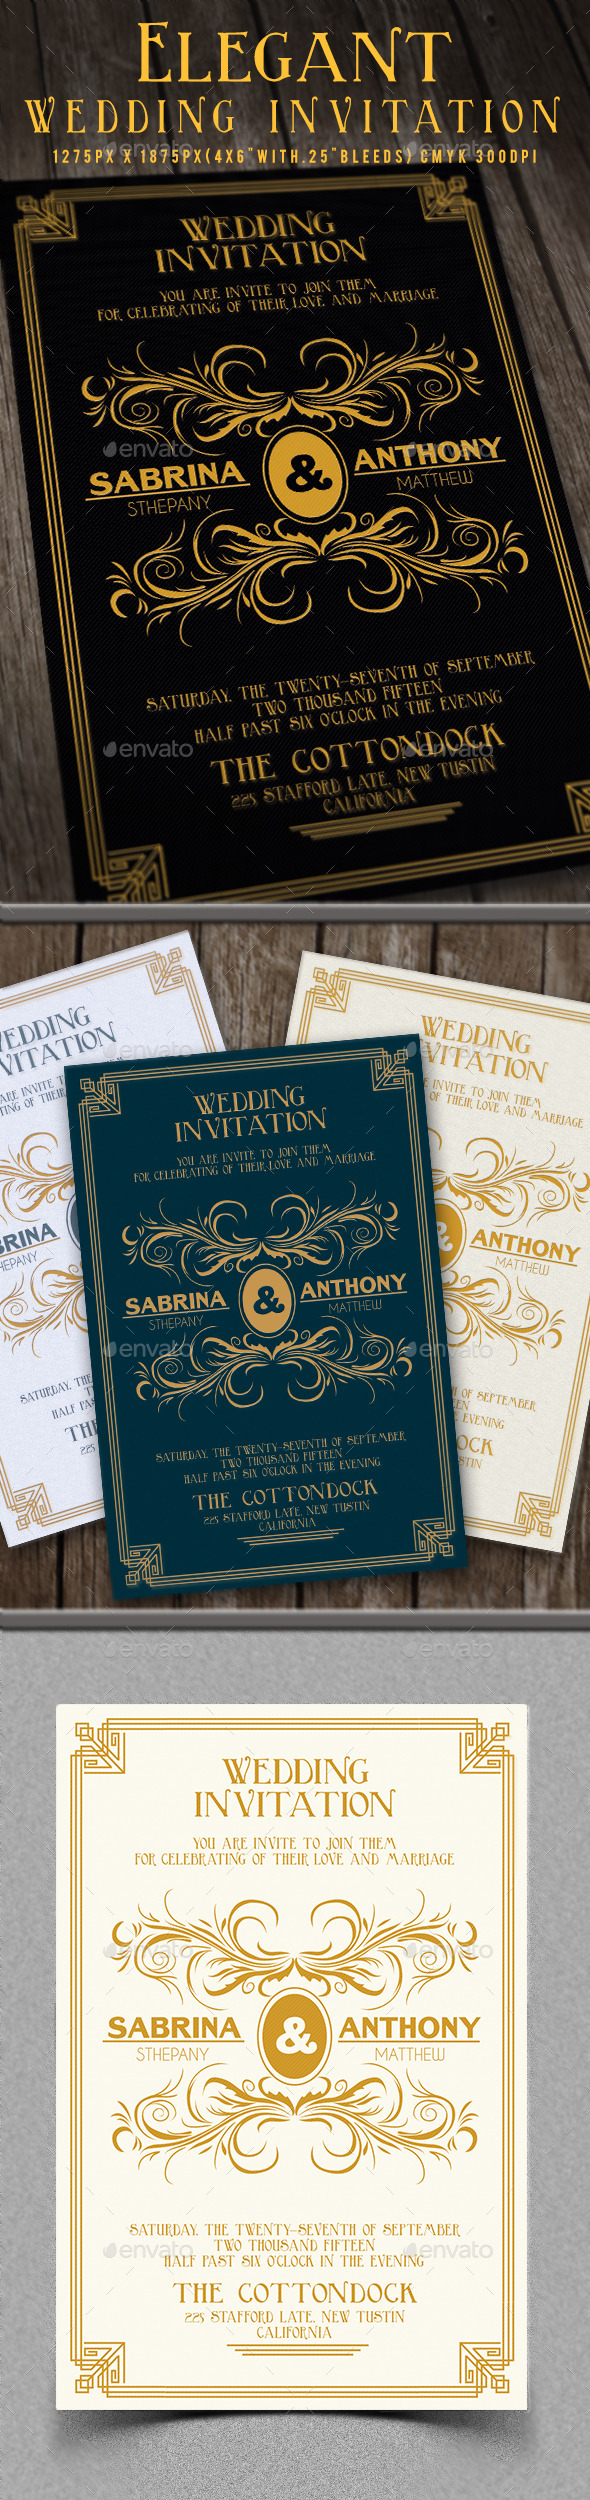 Elegant Wedding Invitation - Invitations Cards & Invites